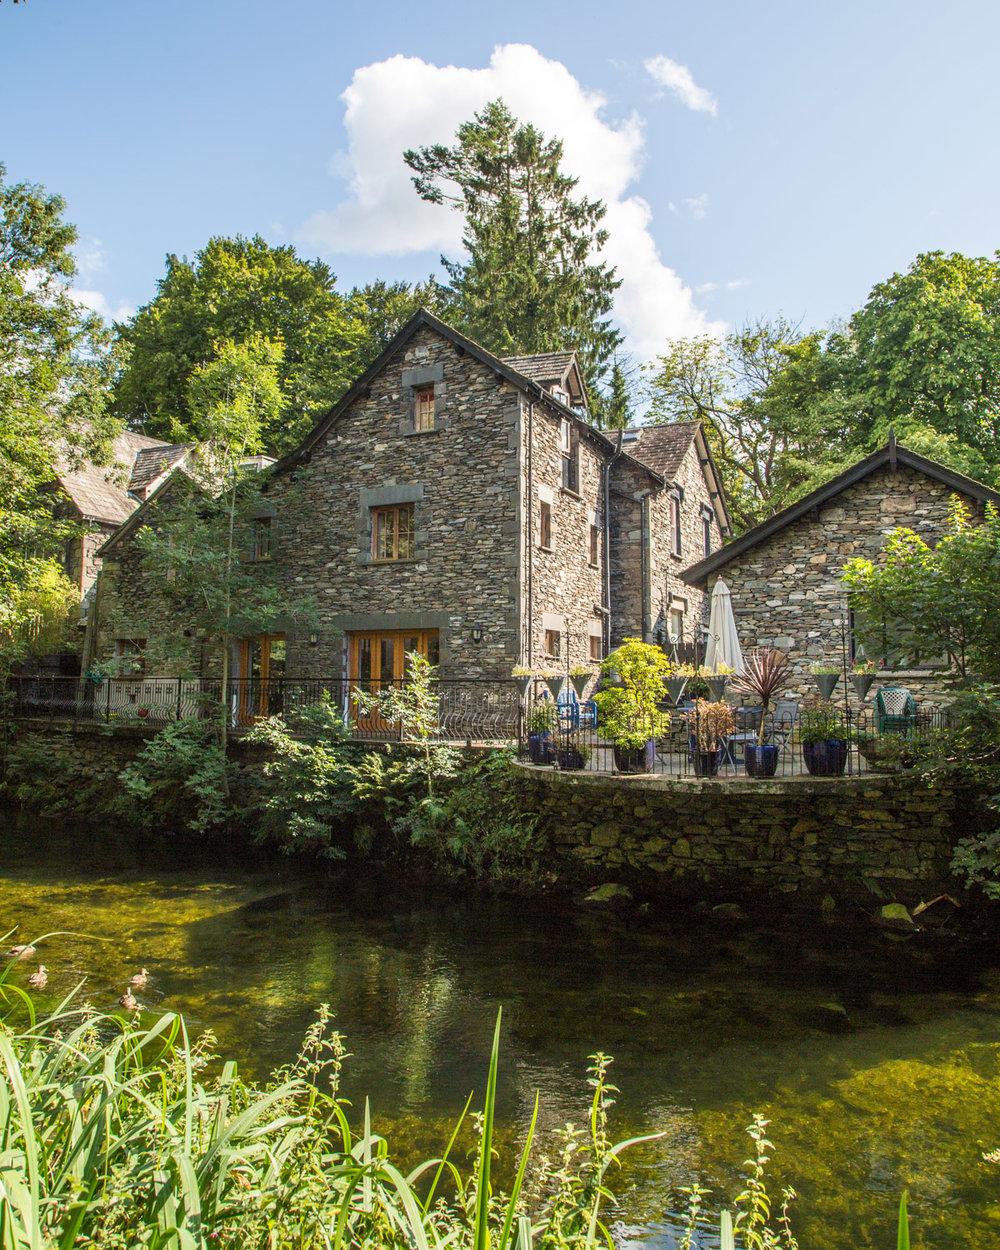 Grasmere Village, Lake District England